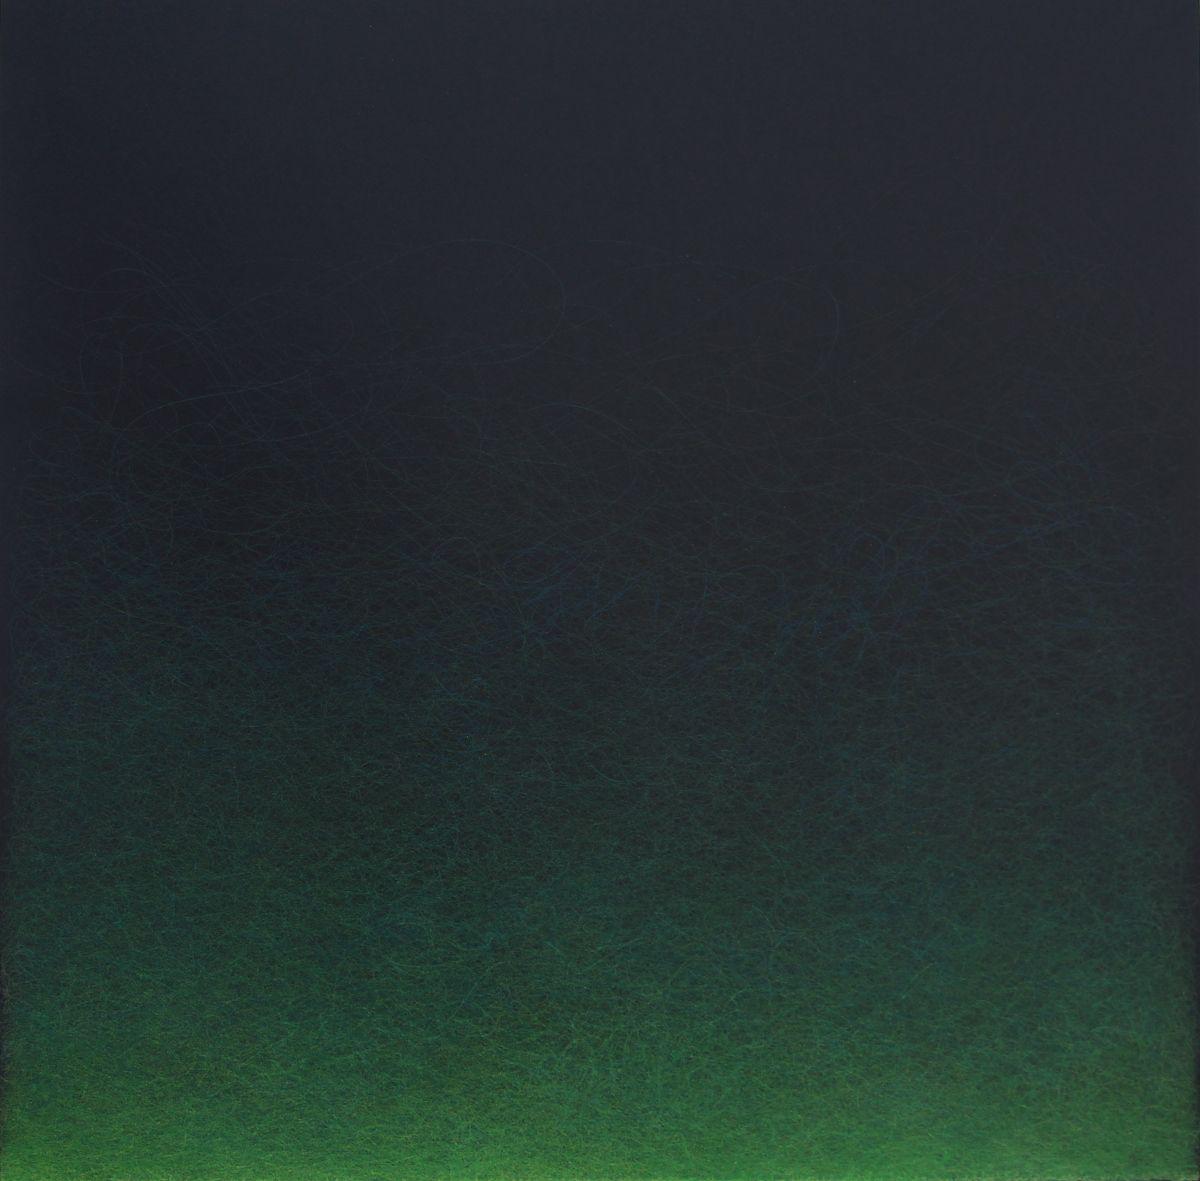 Quantum Entanglement (Green 1)